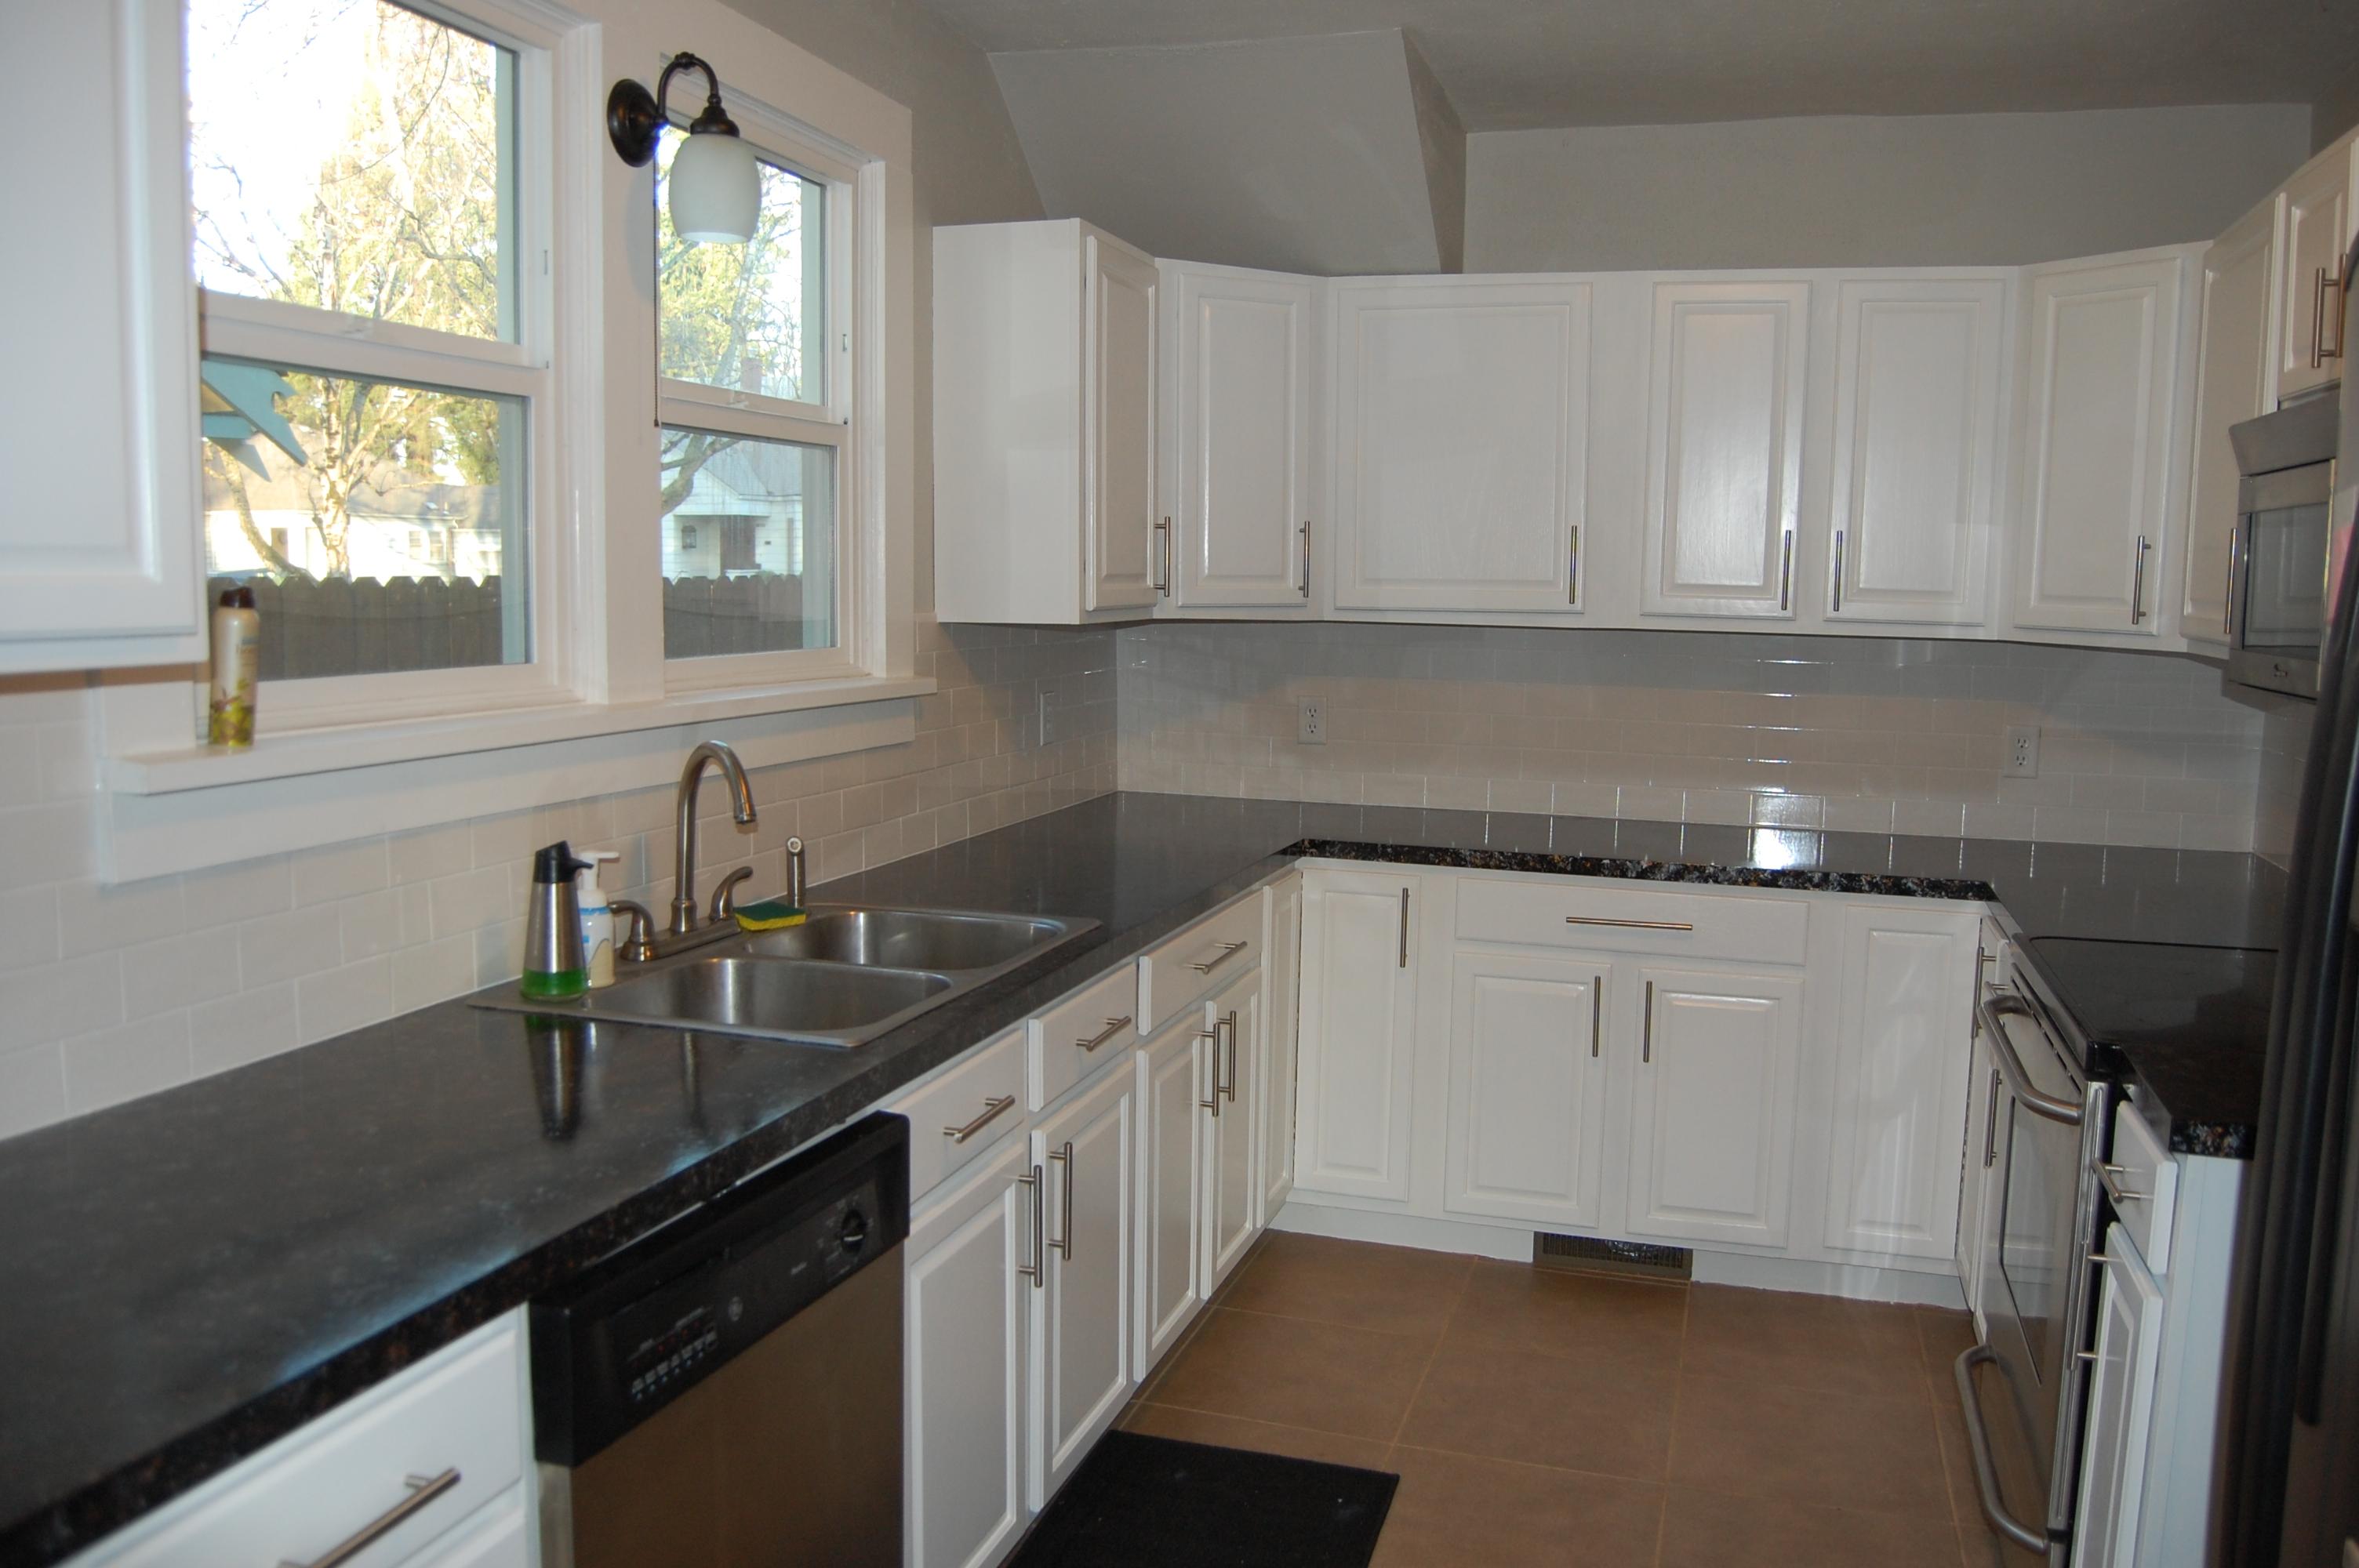 painting kitchen cabinets paint kitchen cabinets white My kitchen